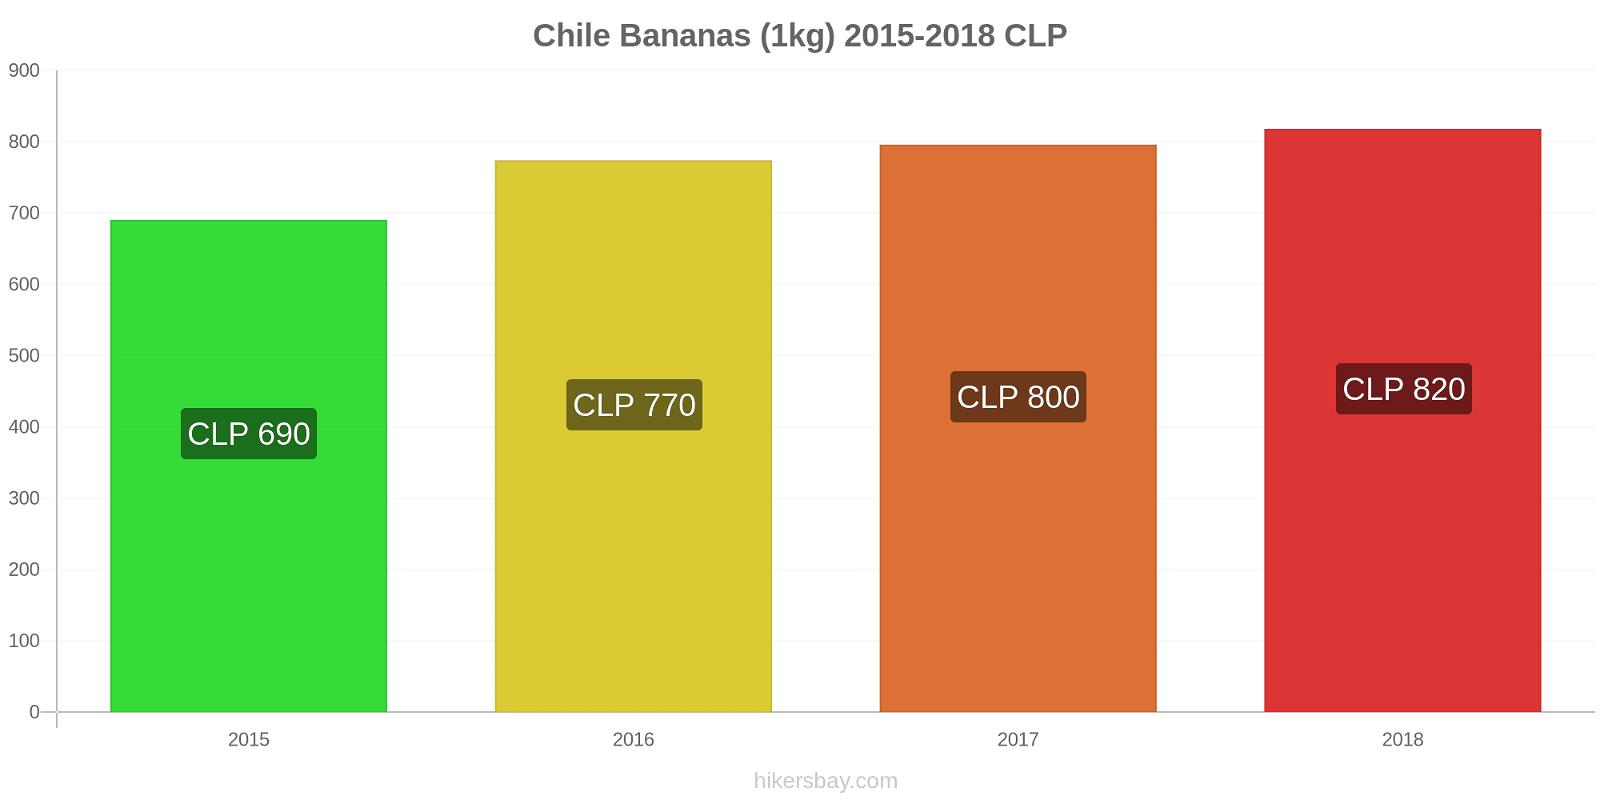 Chile price changes Bananas (1kg) hikersbay.com